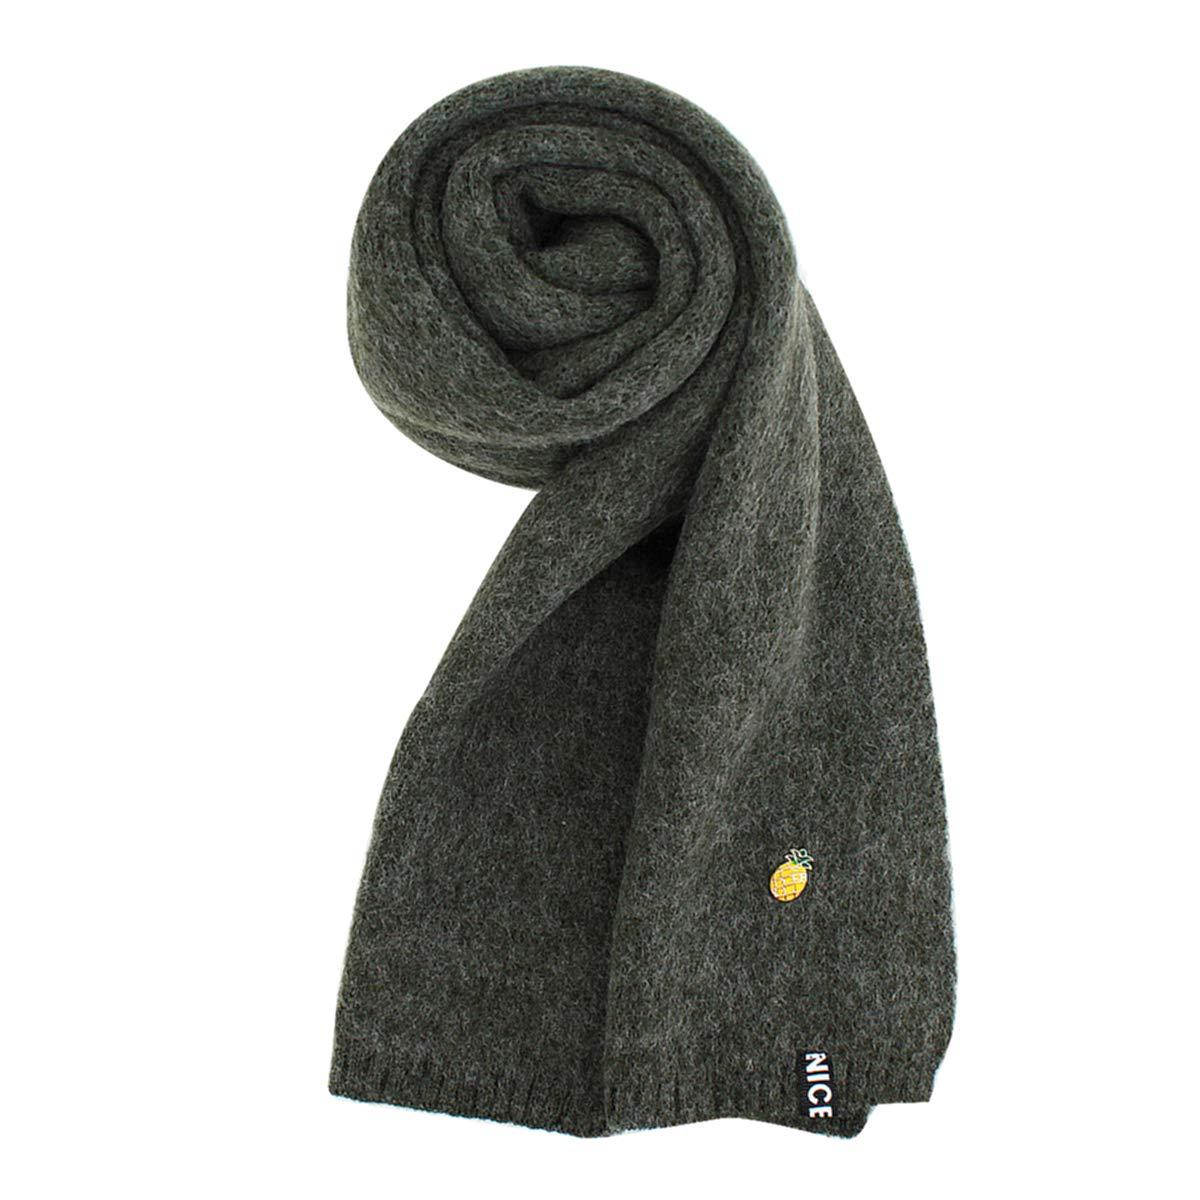 Monique Kids Pineapple Décor Woolen Yarn Knit Scarf Autumn Winter Warm Long Scarf Grey